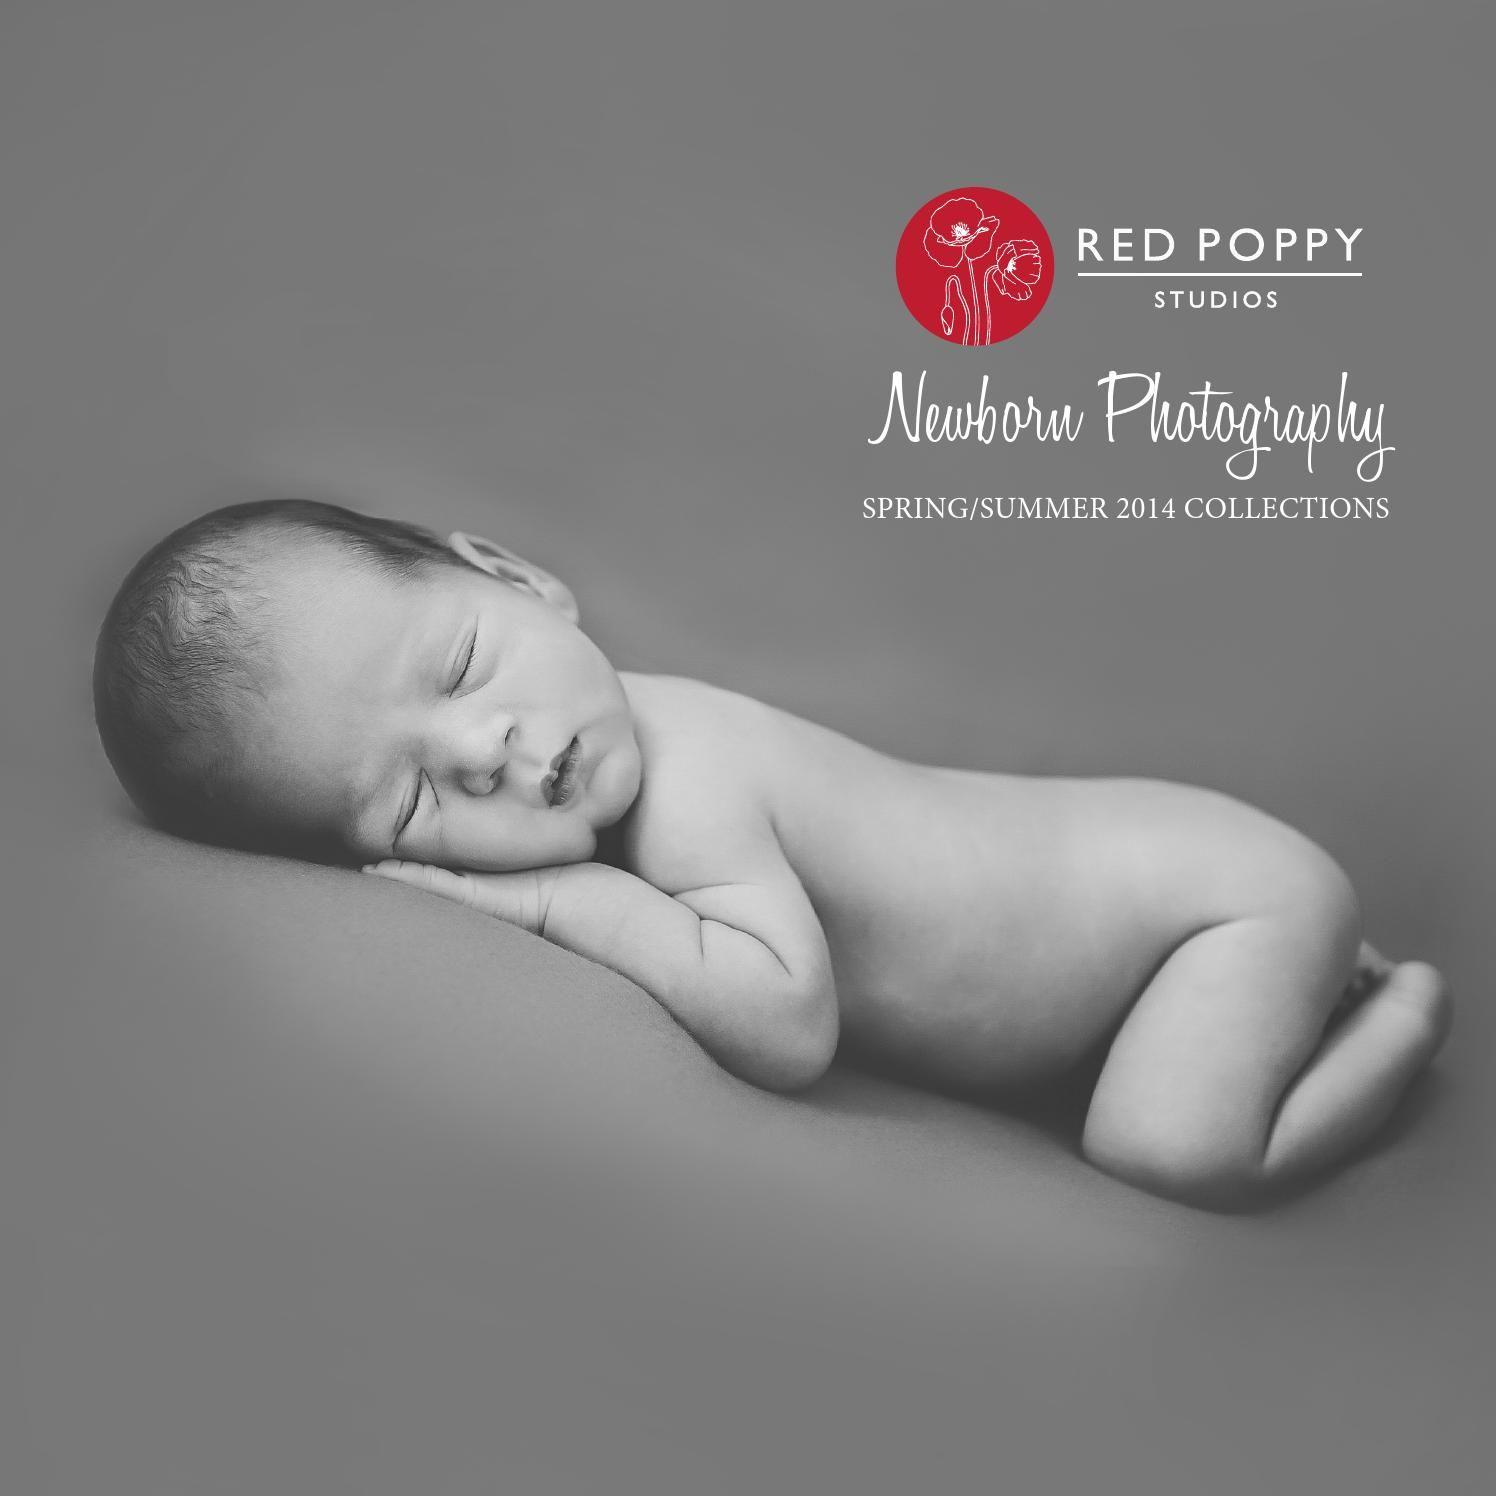 Newborn collections spring/summer 2014  Red Poppy Studios Newborn Photography Price list Spring/Summer 2014